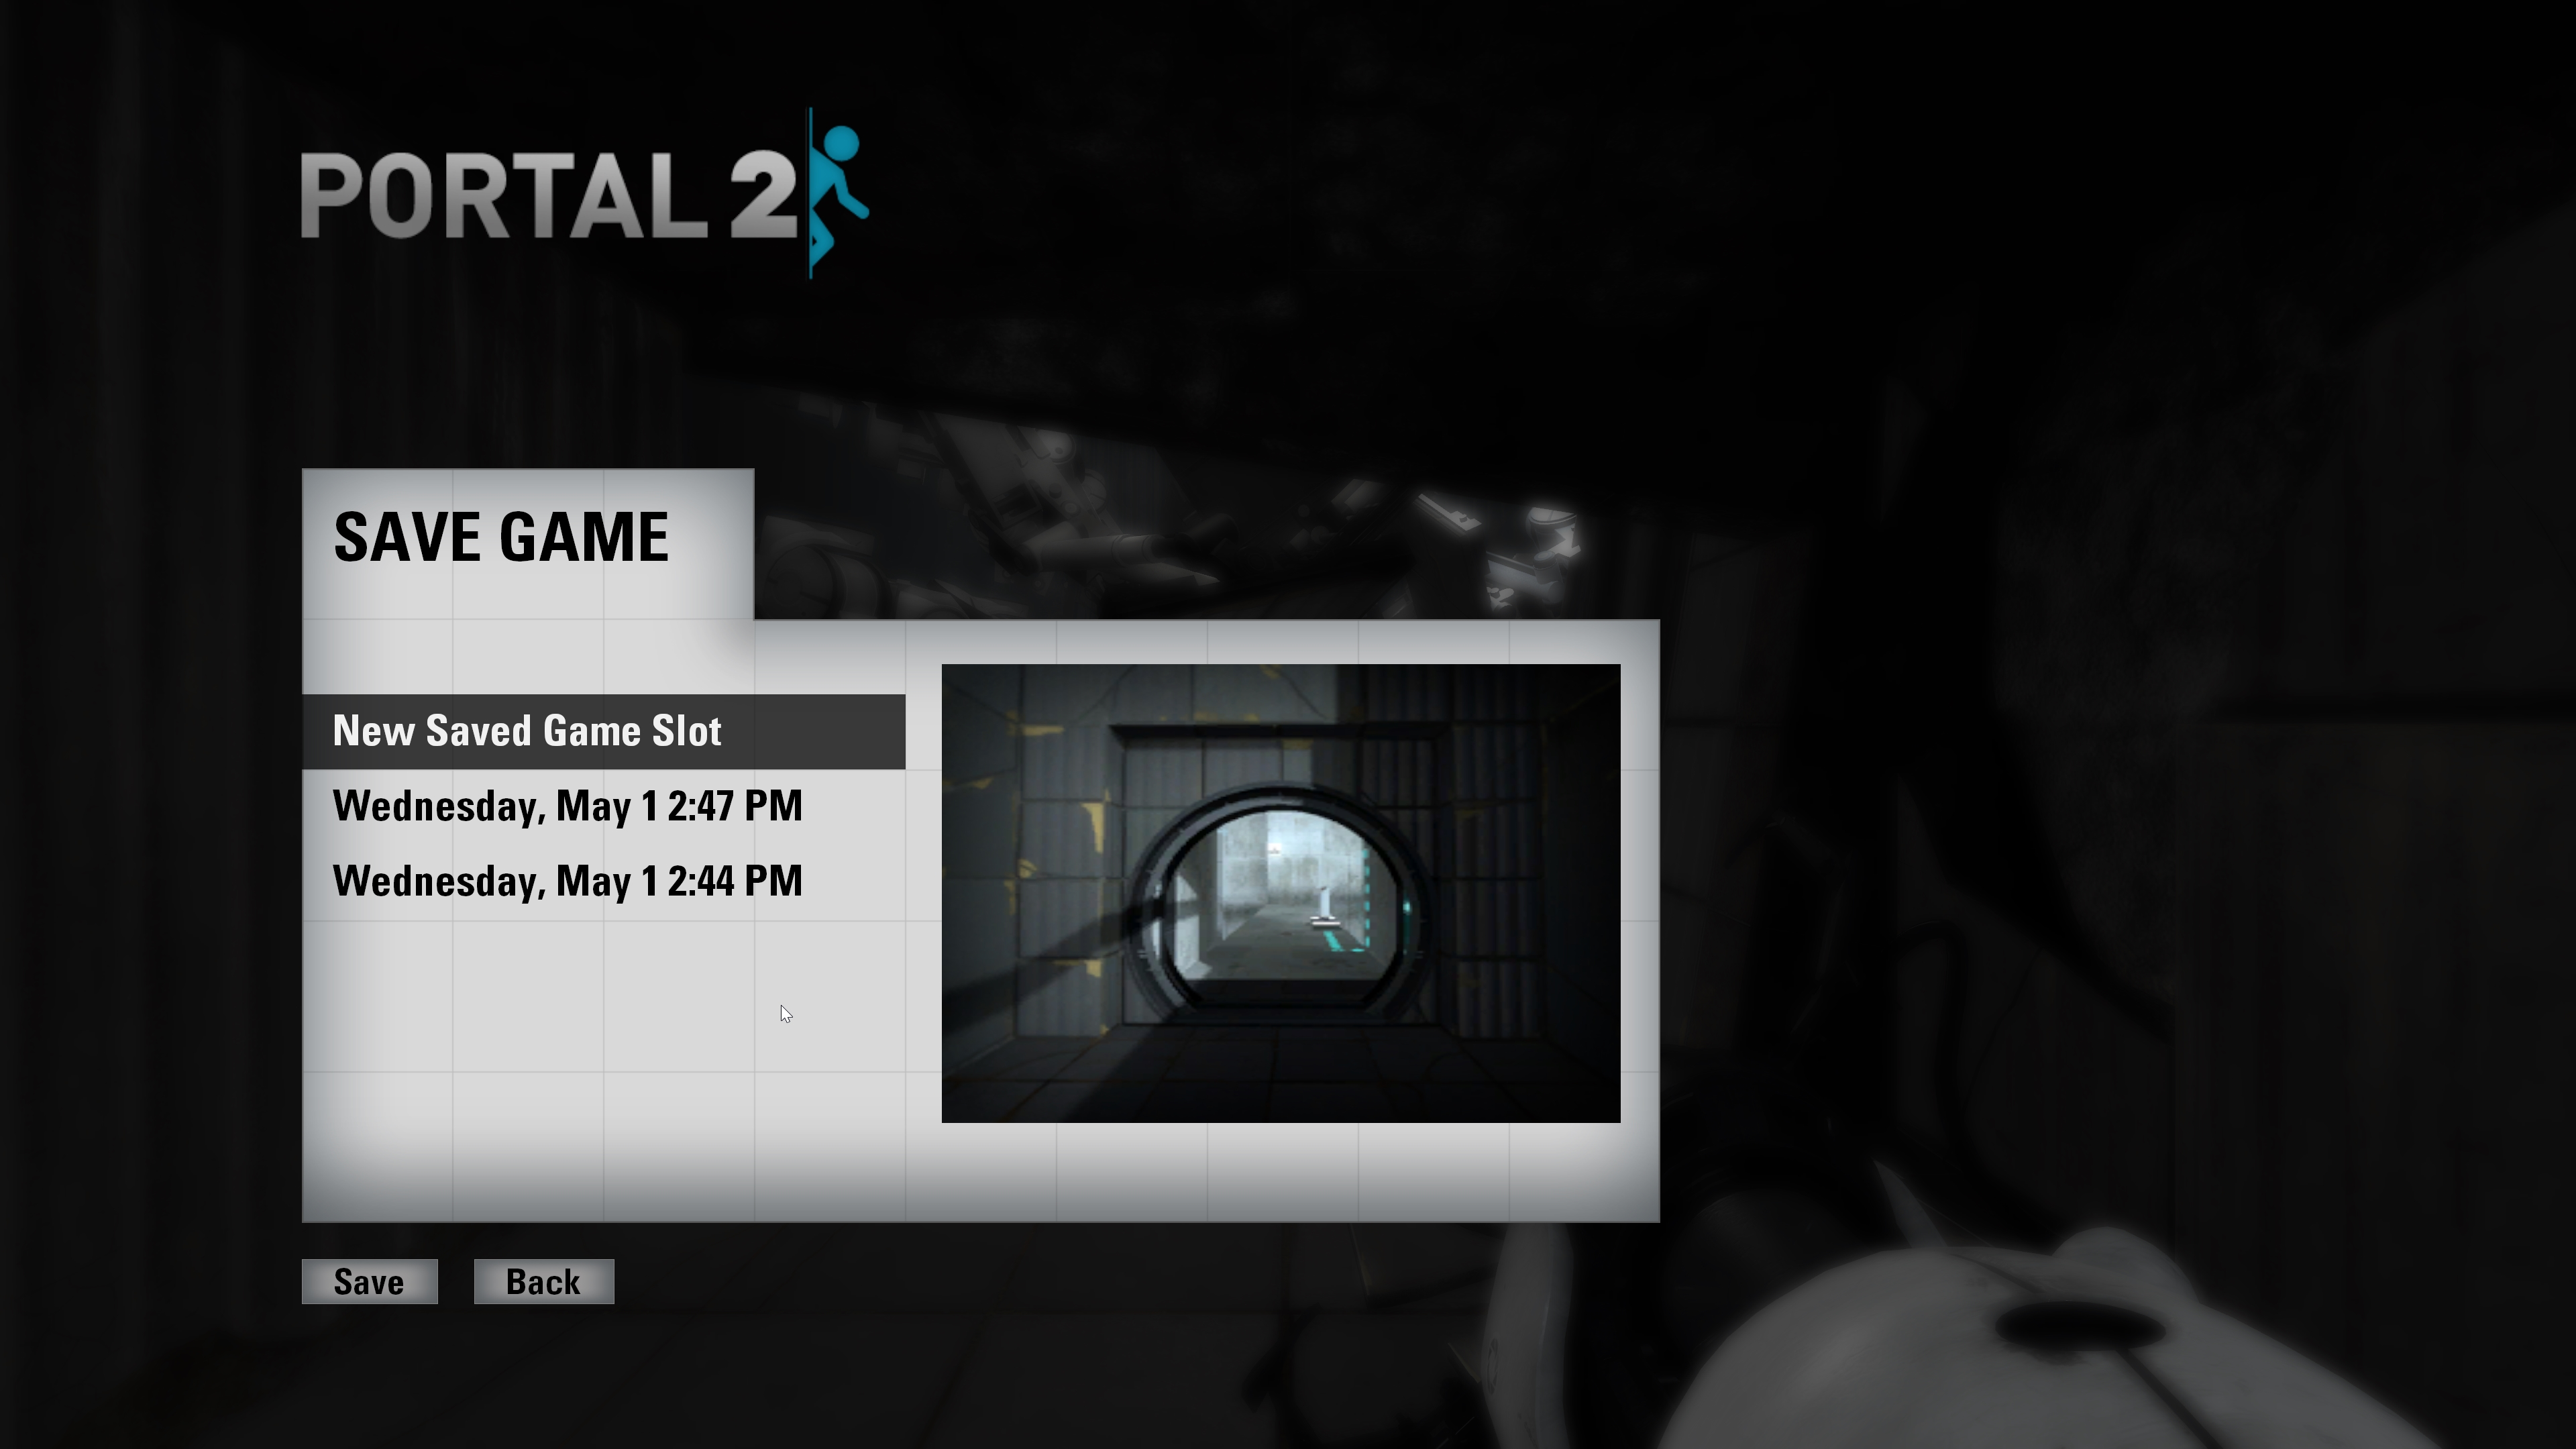 Portal 2 save game location rockway beach mo casino